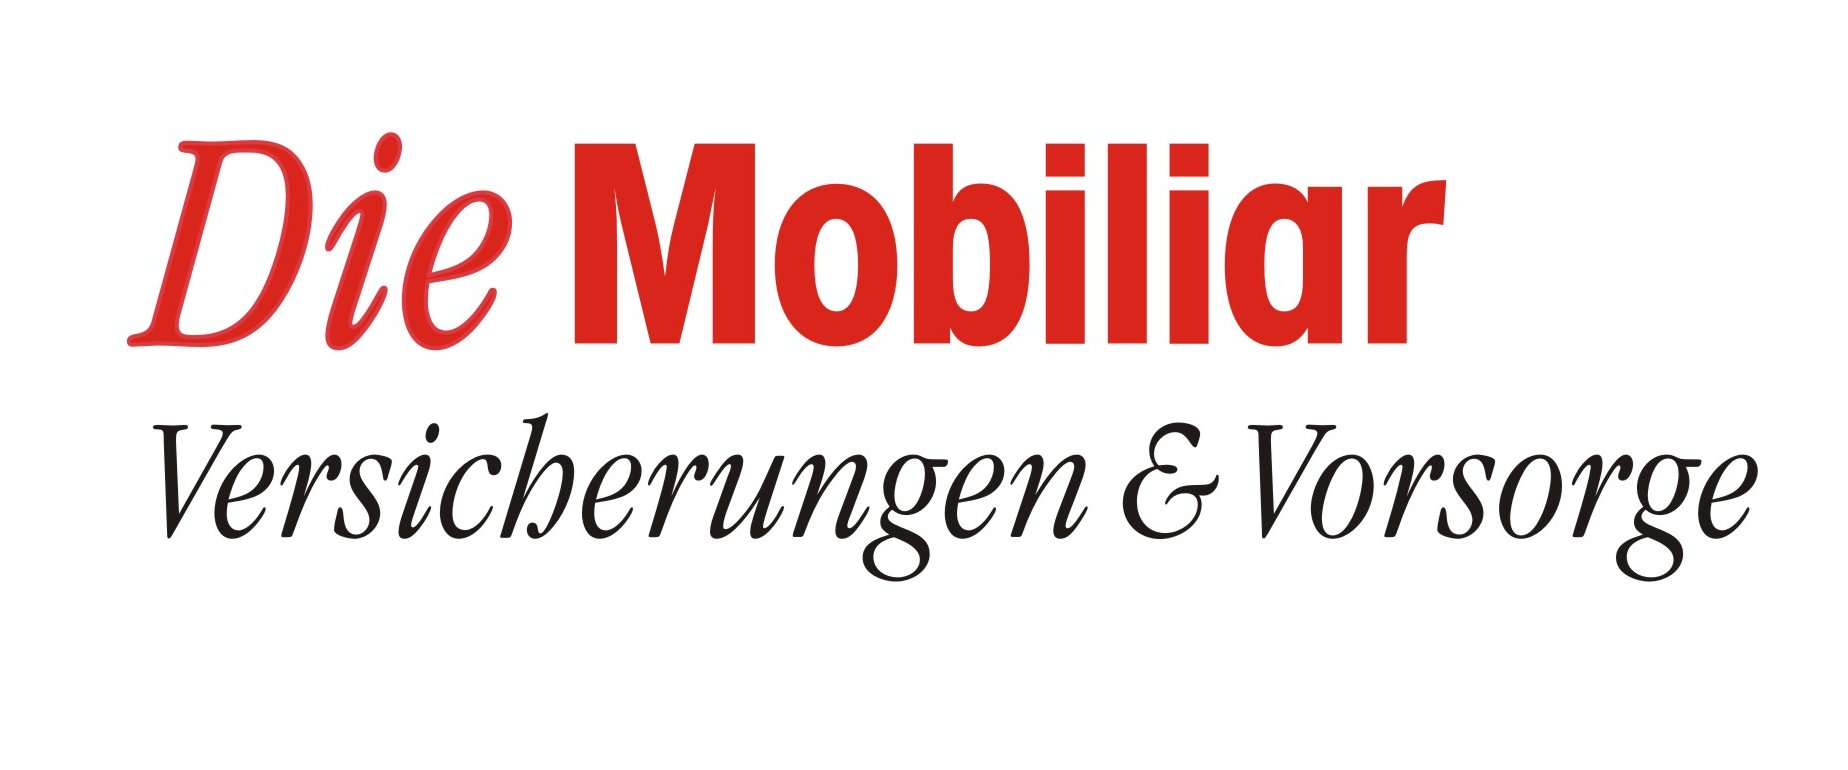 Die mobiliar stucki leadership for Versicherung mobiliar